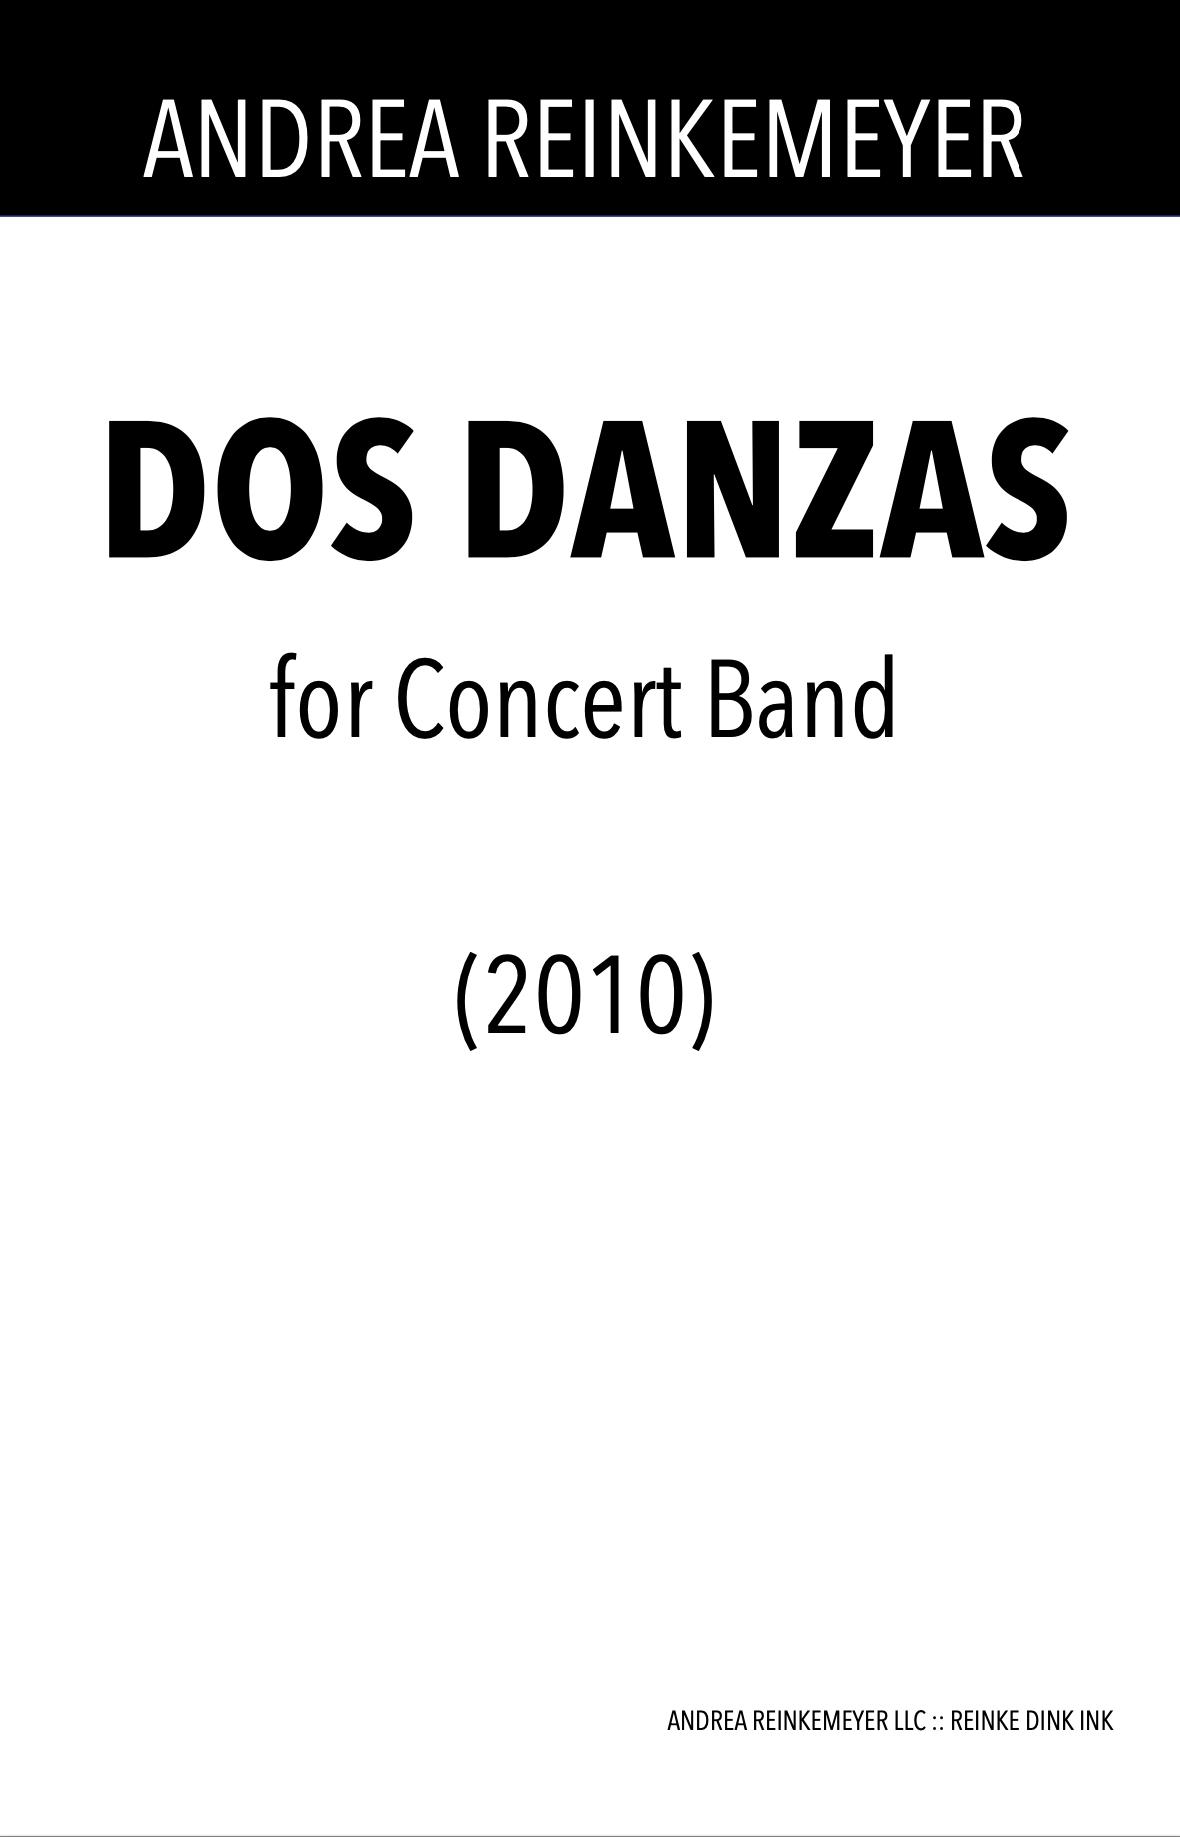 Dos Danzas by Andrea Reinkemeyer